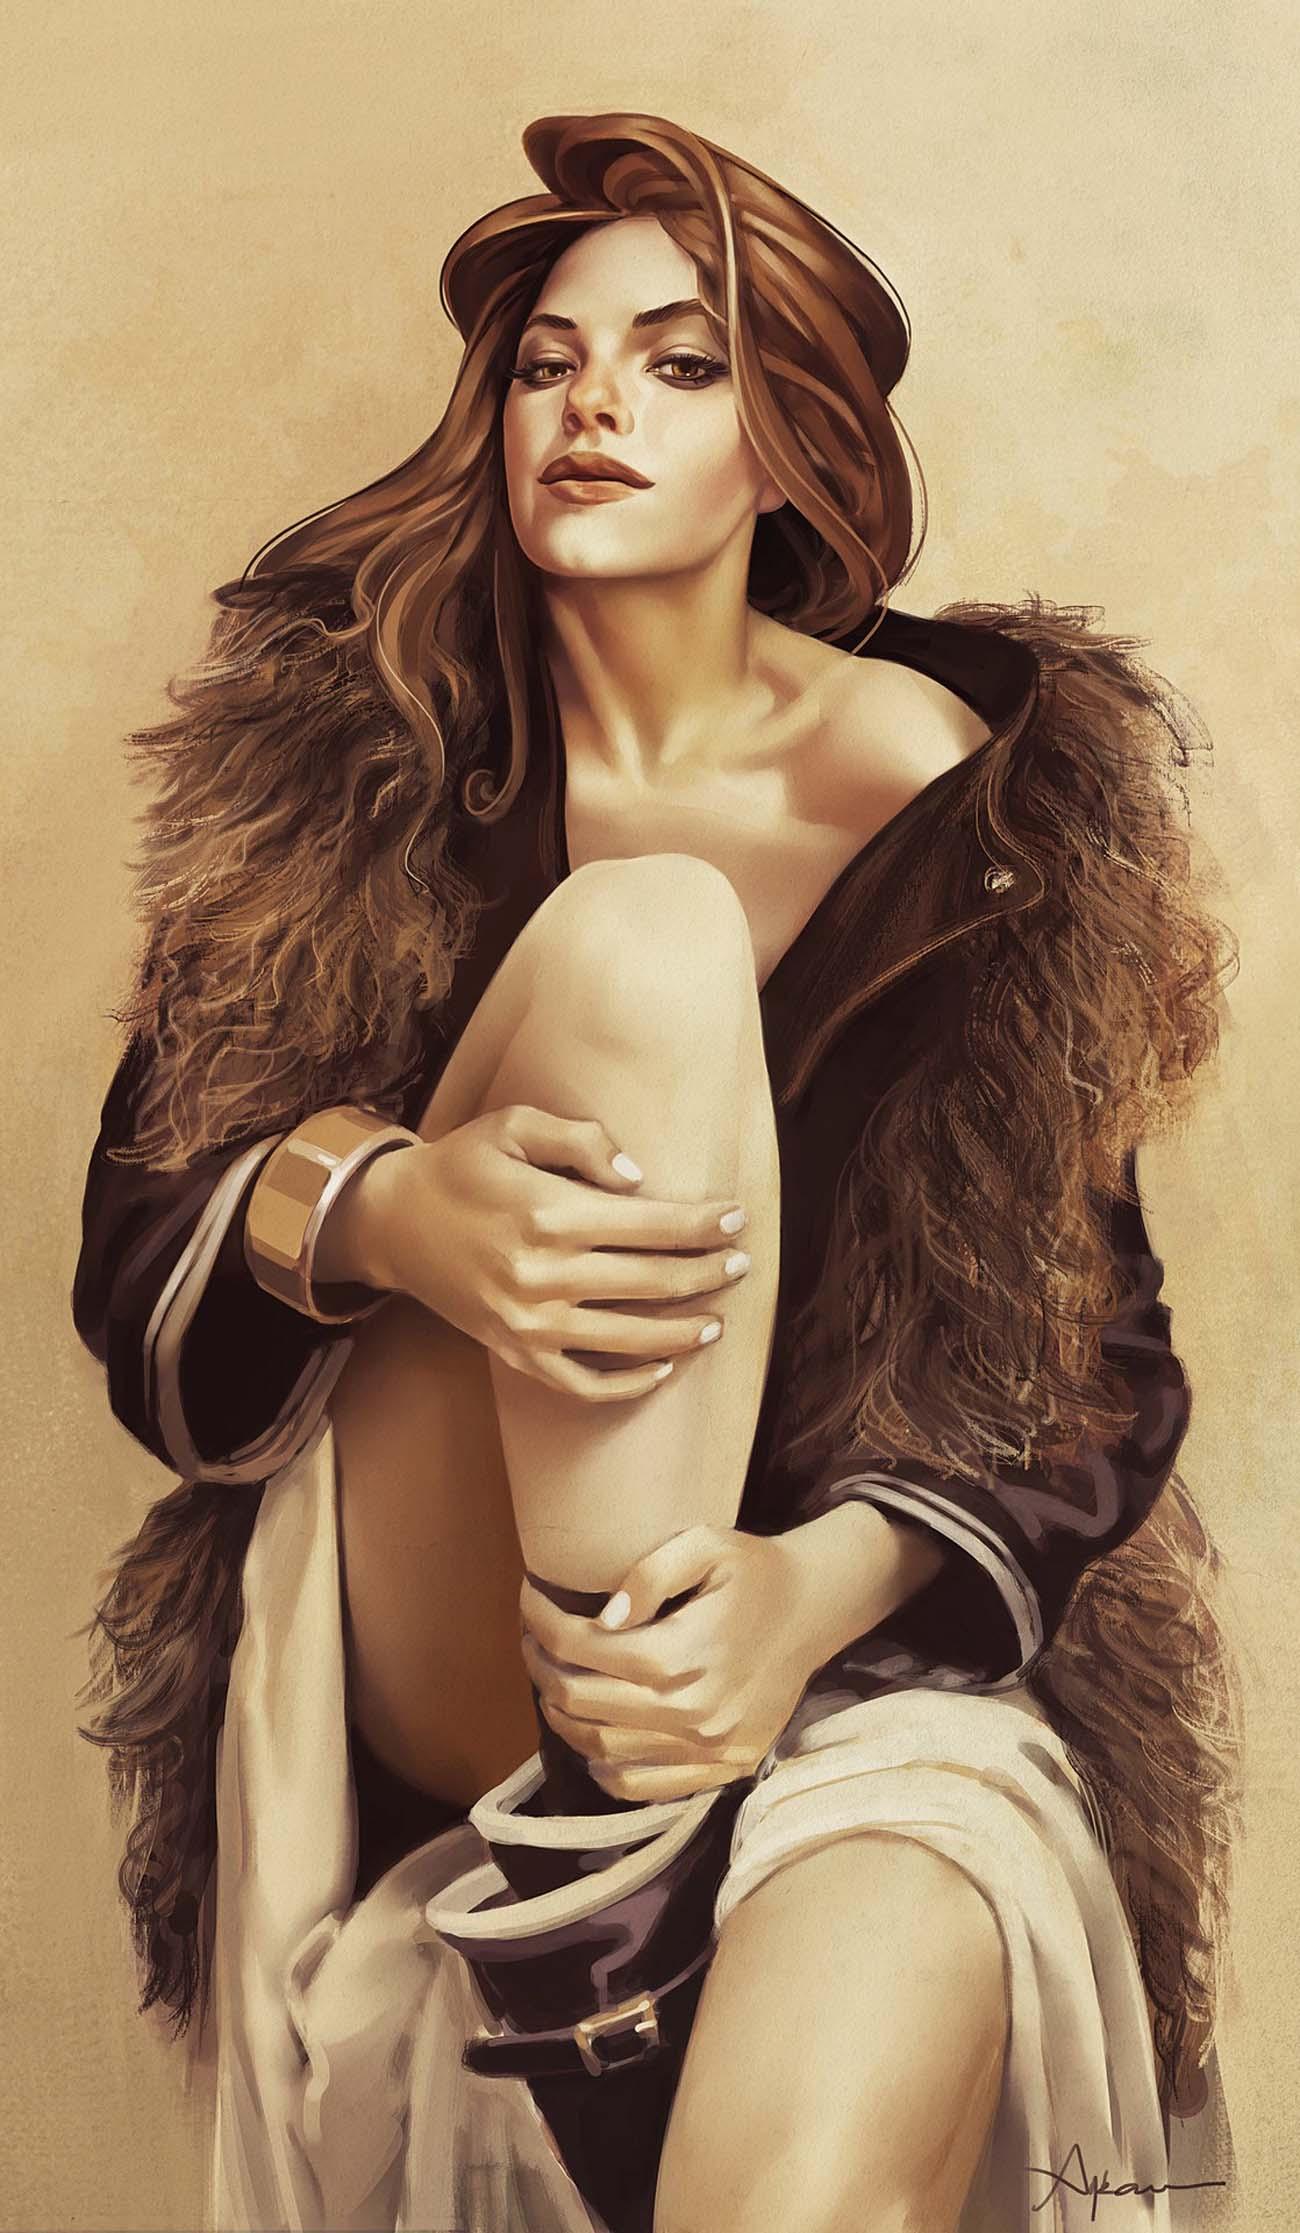 Ayran Oberto | Paintable.cc Digital Painting Inspiration - Learn the Art of Digital Painting! #digitalpainting #digitalart